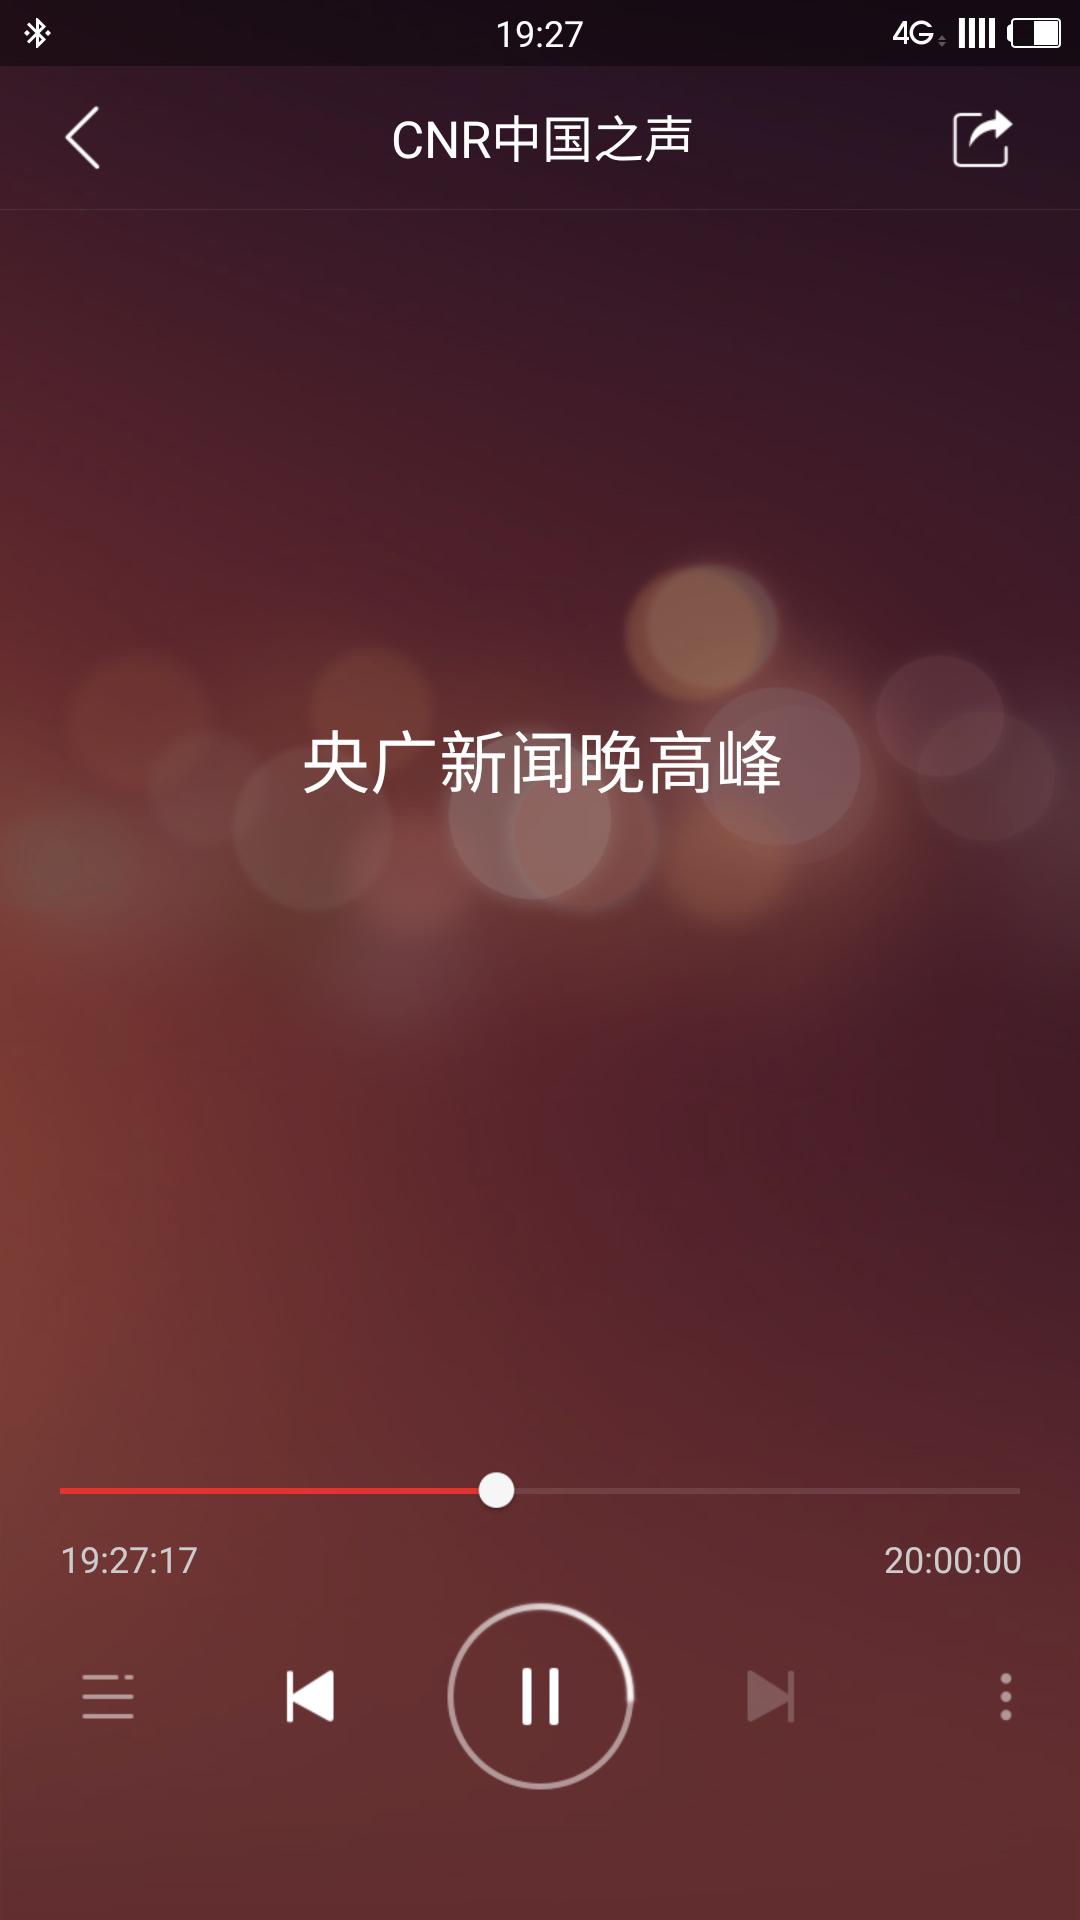 Screenshot_20160813-192733.png